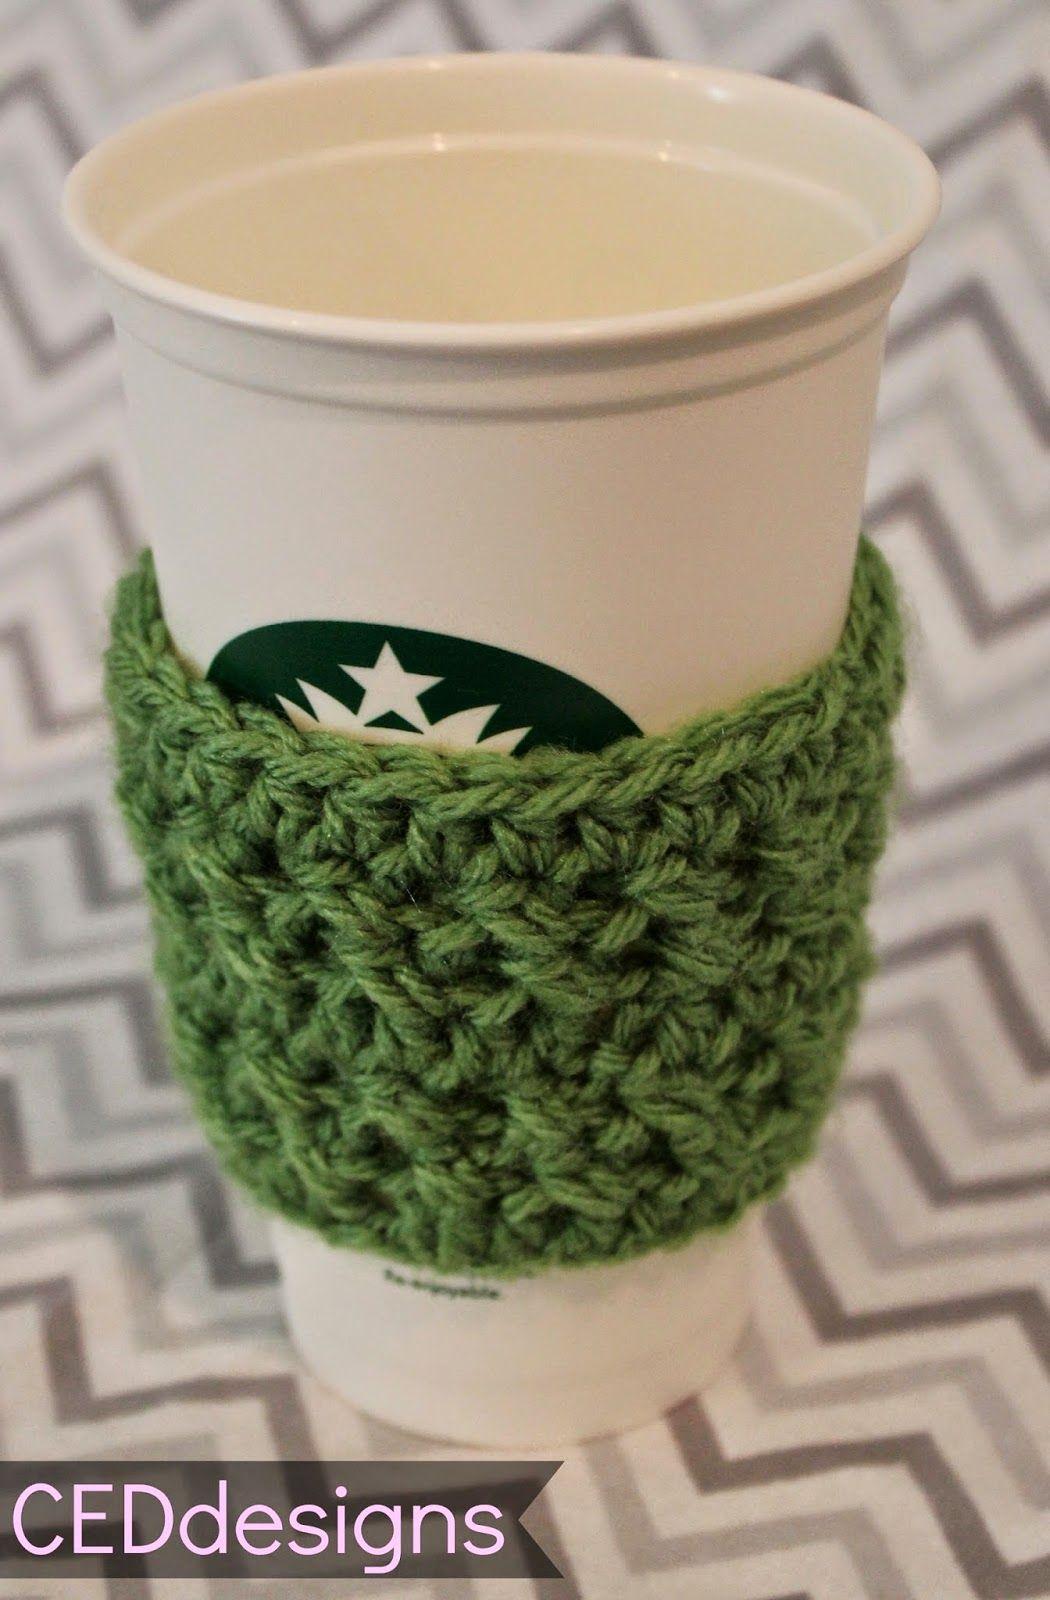 Amigurumi Starbucks : CEDdesigns: New FREE Pattern: Crochet Coffee Sleeve ...